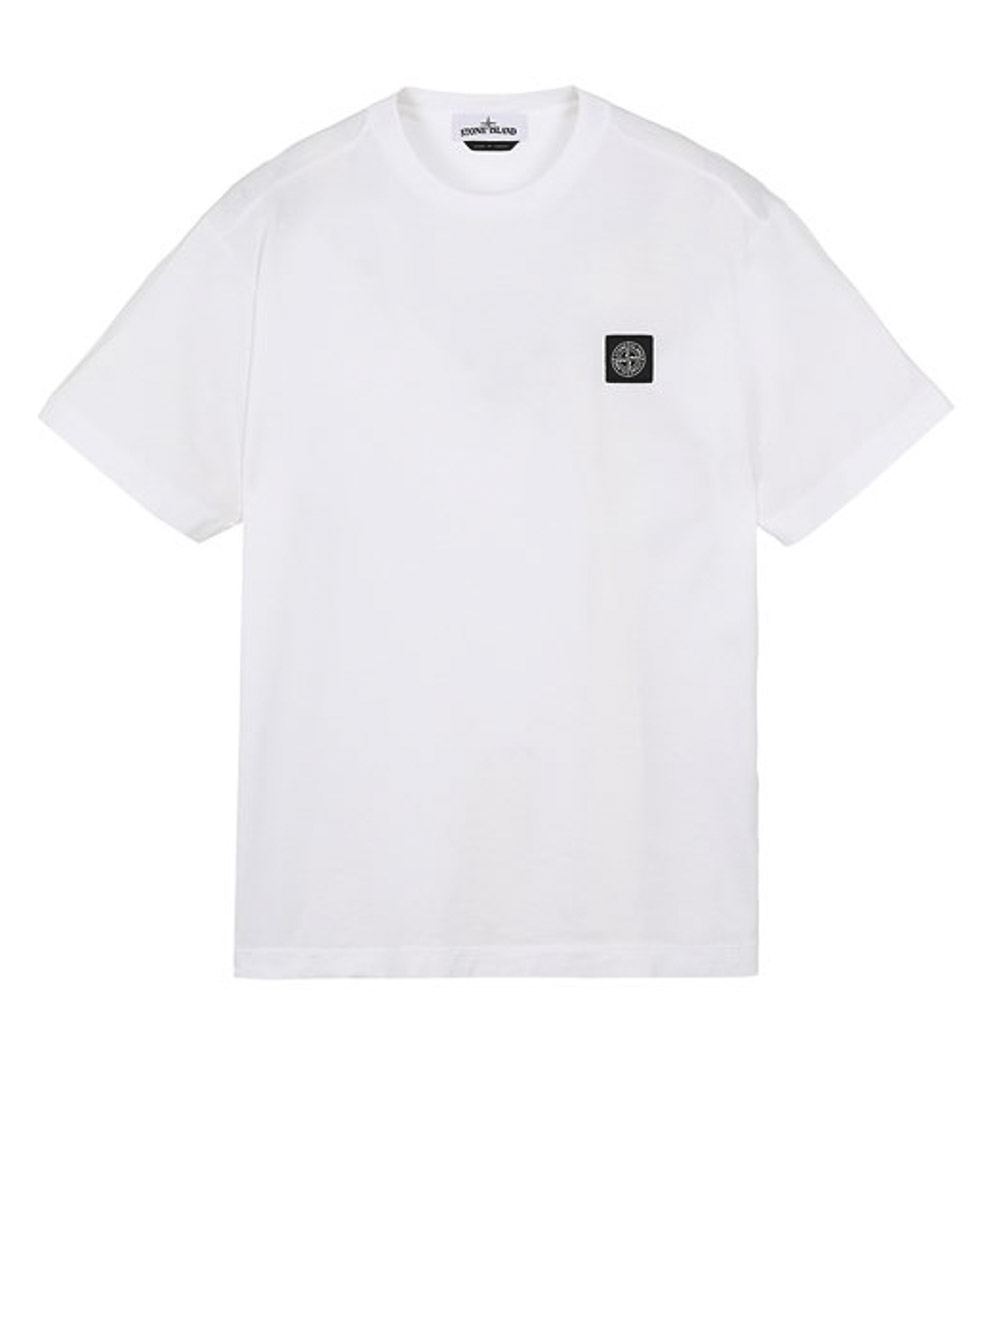 STONE ISLAND Μπλούζα T-Shirt MO741524113-V0001 ΛΕΥΚΟ